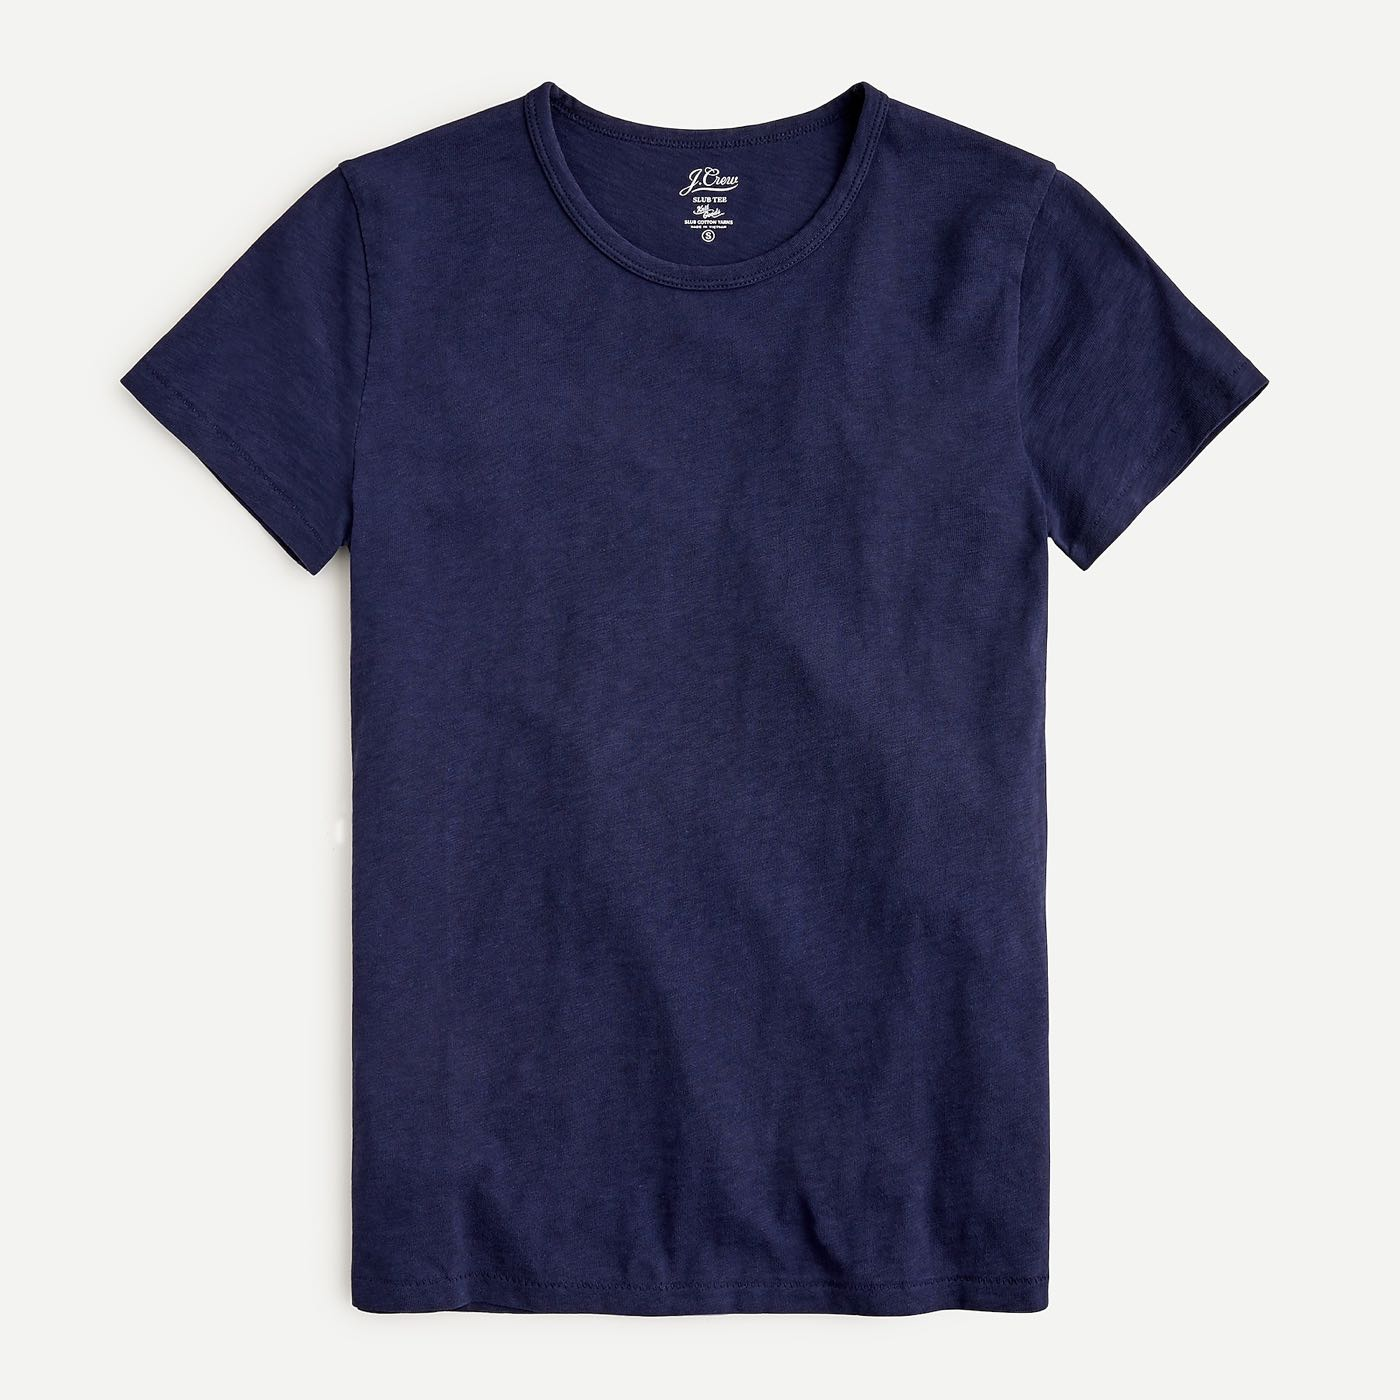 全新正品J.Crew Painter slub fitted crewneck T-shirt黑色合身棉T